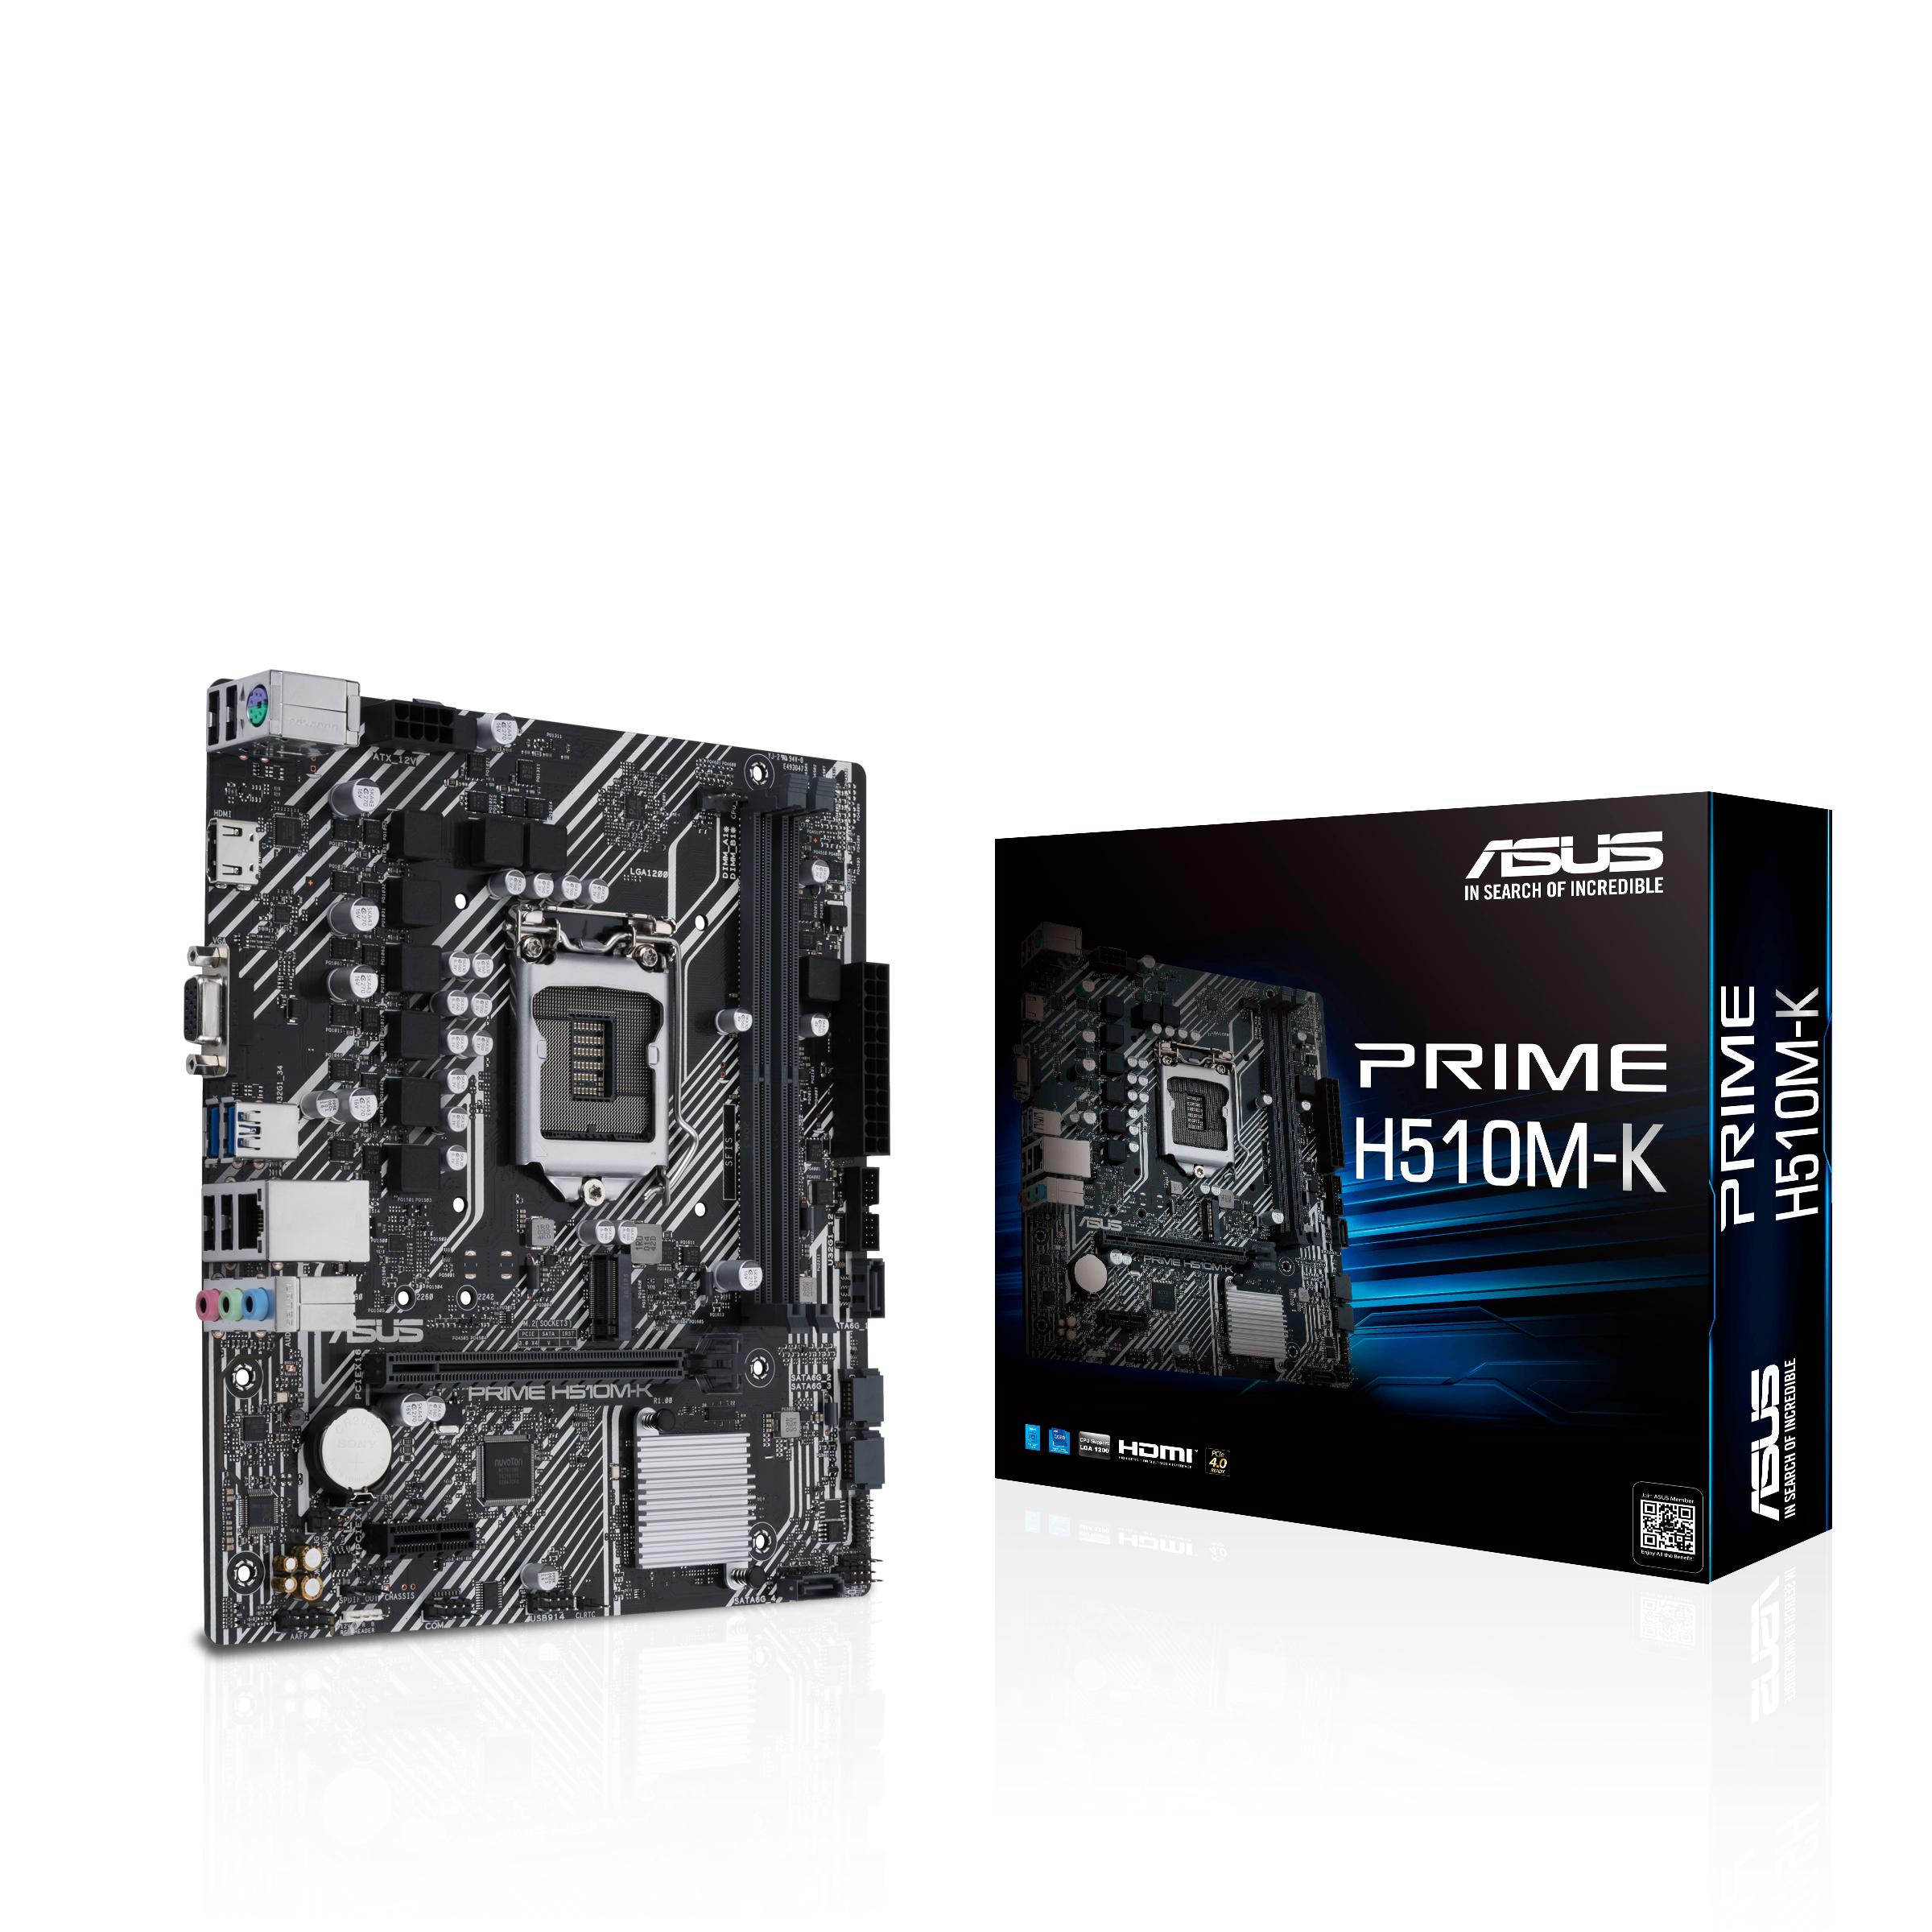 ASUS PRIME H510M-K - Motherboard - micro ATX - LGA1200-Sockel - H510 - USB 3.2 Gen 1 - Gigabit LAN - Onboard-Grafik (CPU erforderlich)